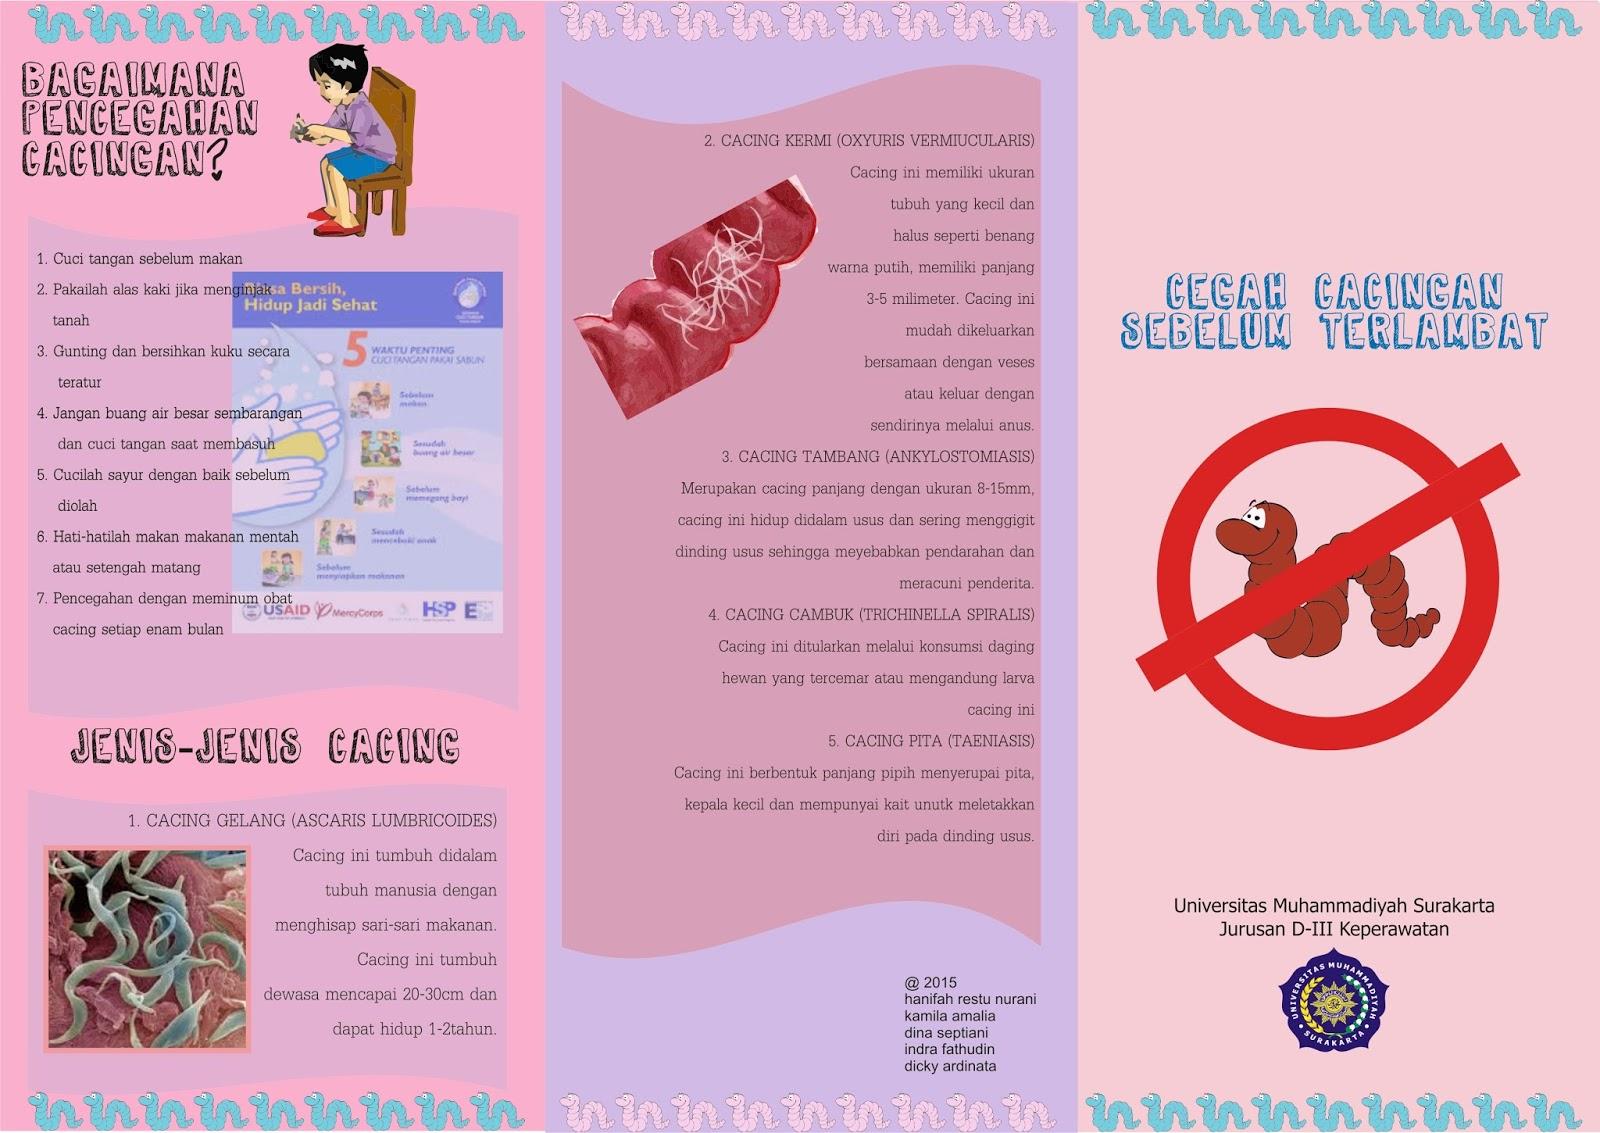 Leaflet Bahaya Cacing Catatan Kamila